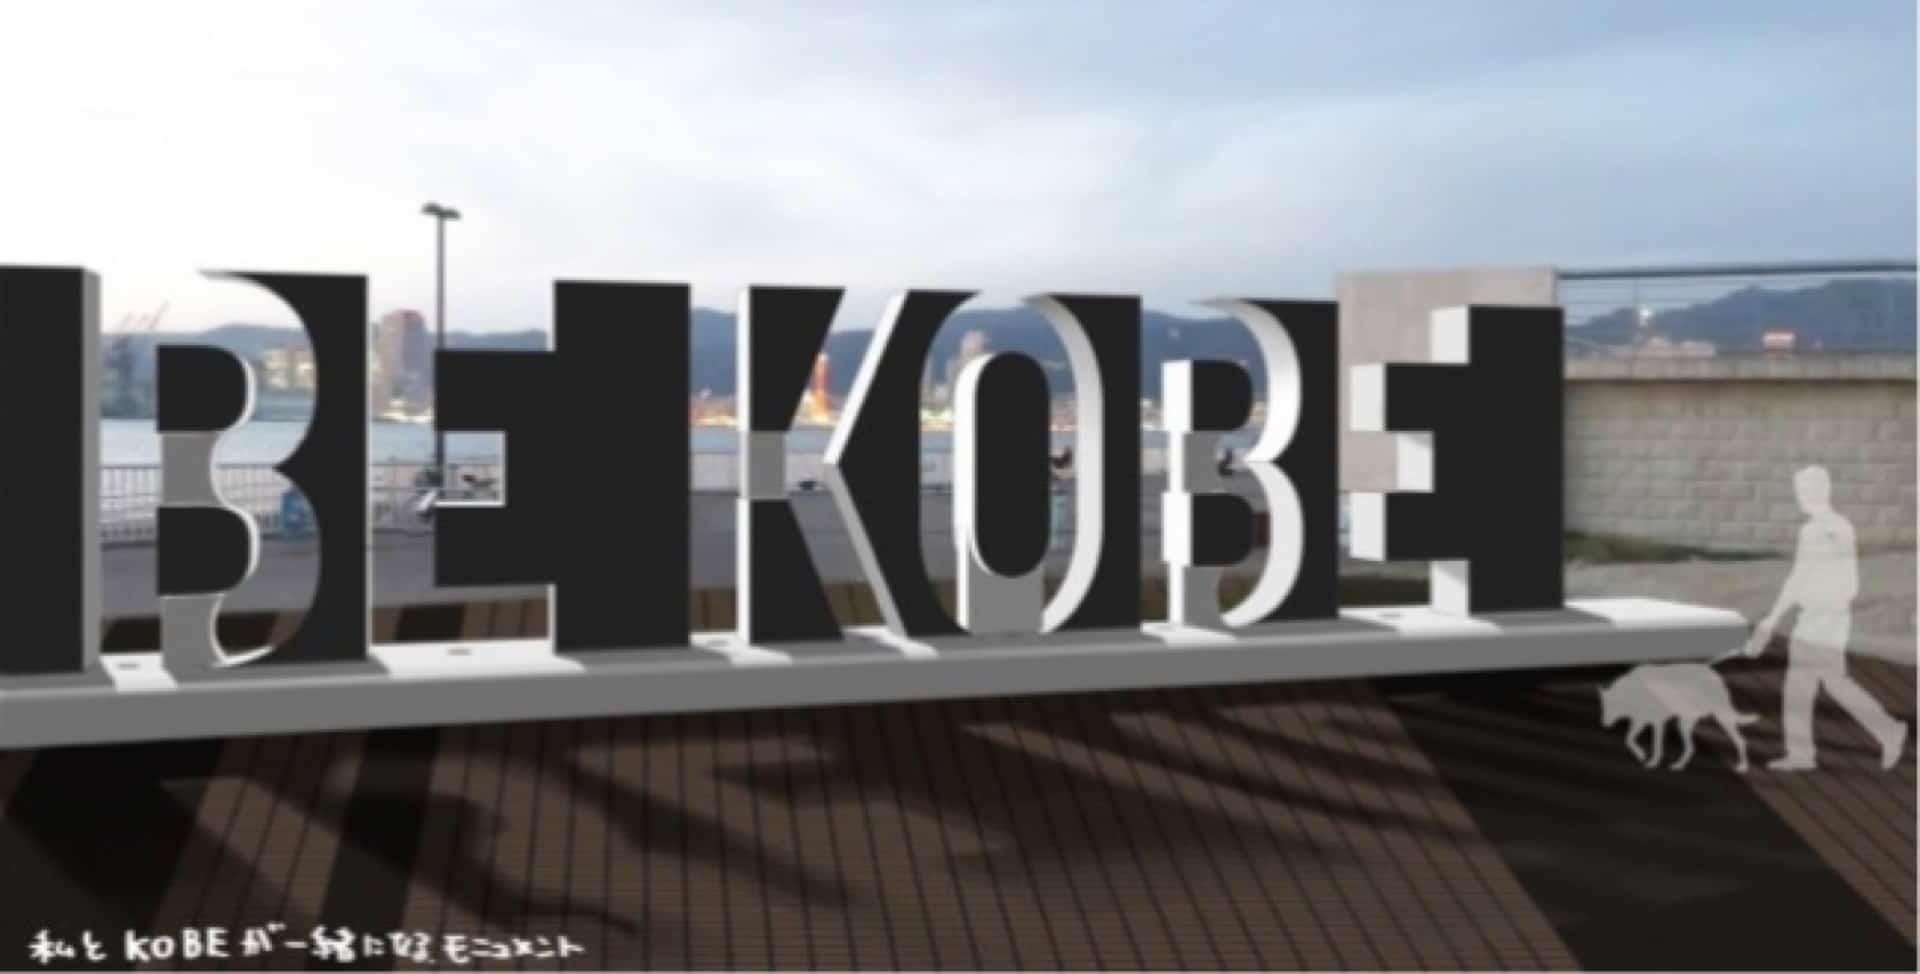 「BE KOBE」モニュメントがポーアイ・しおさい公園にも登場!7月8日に除幕式・点灯式